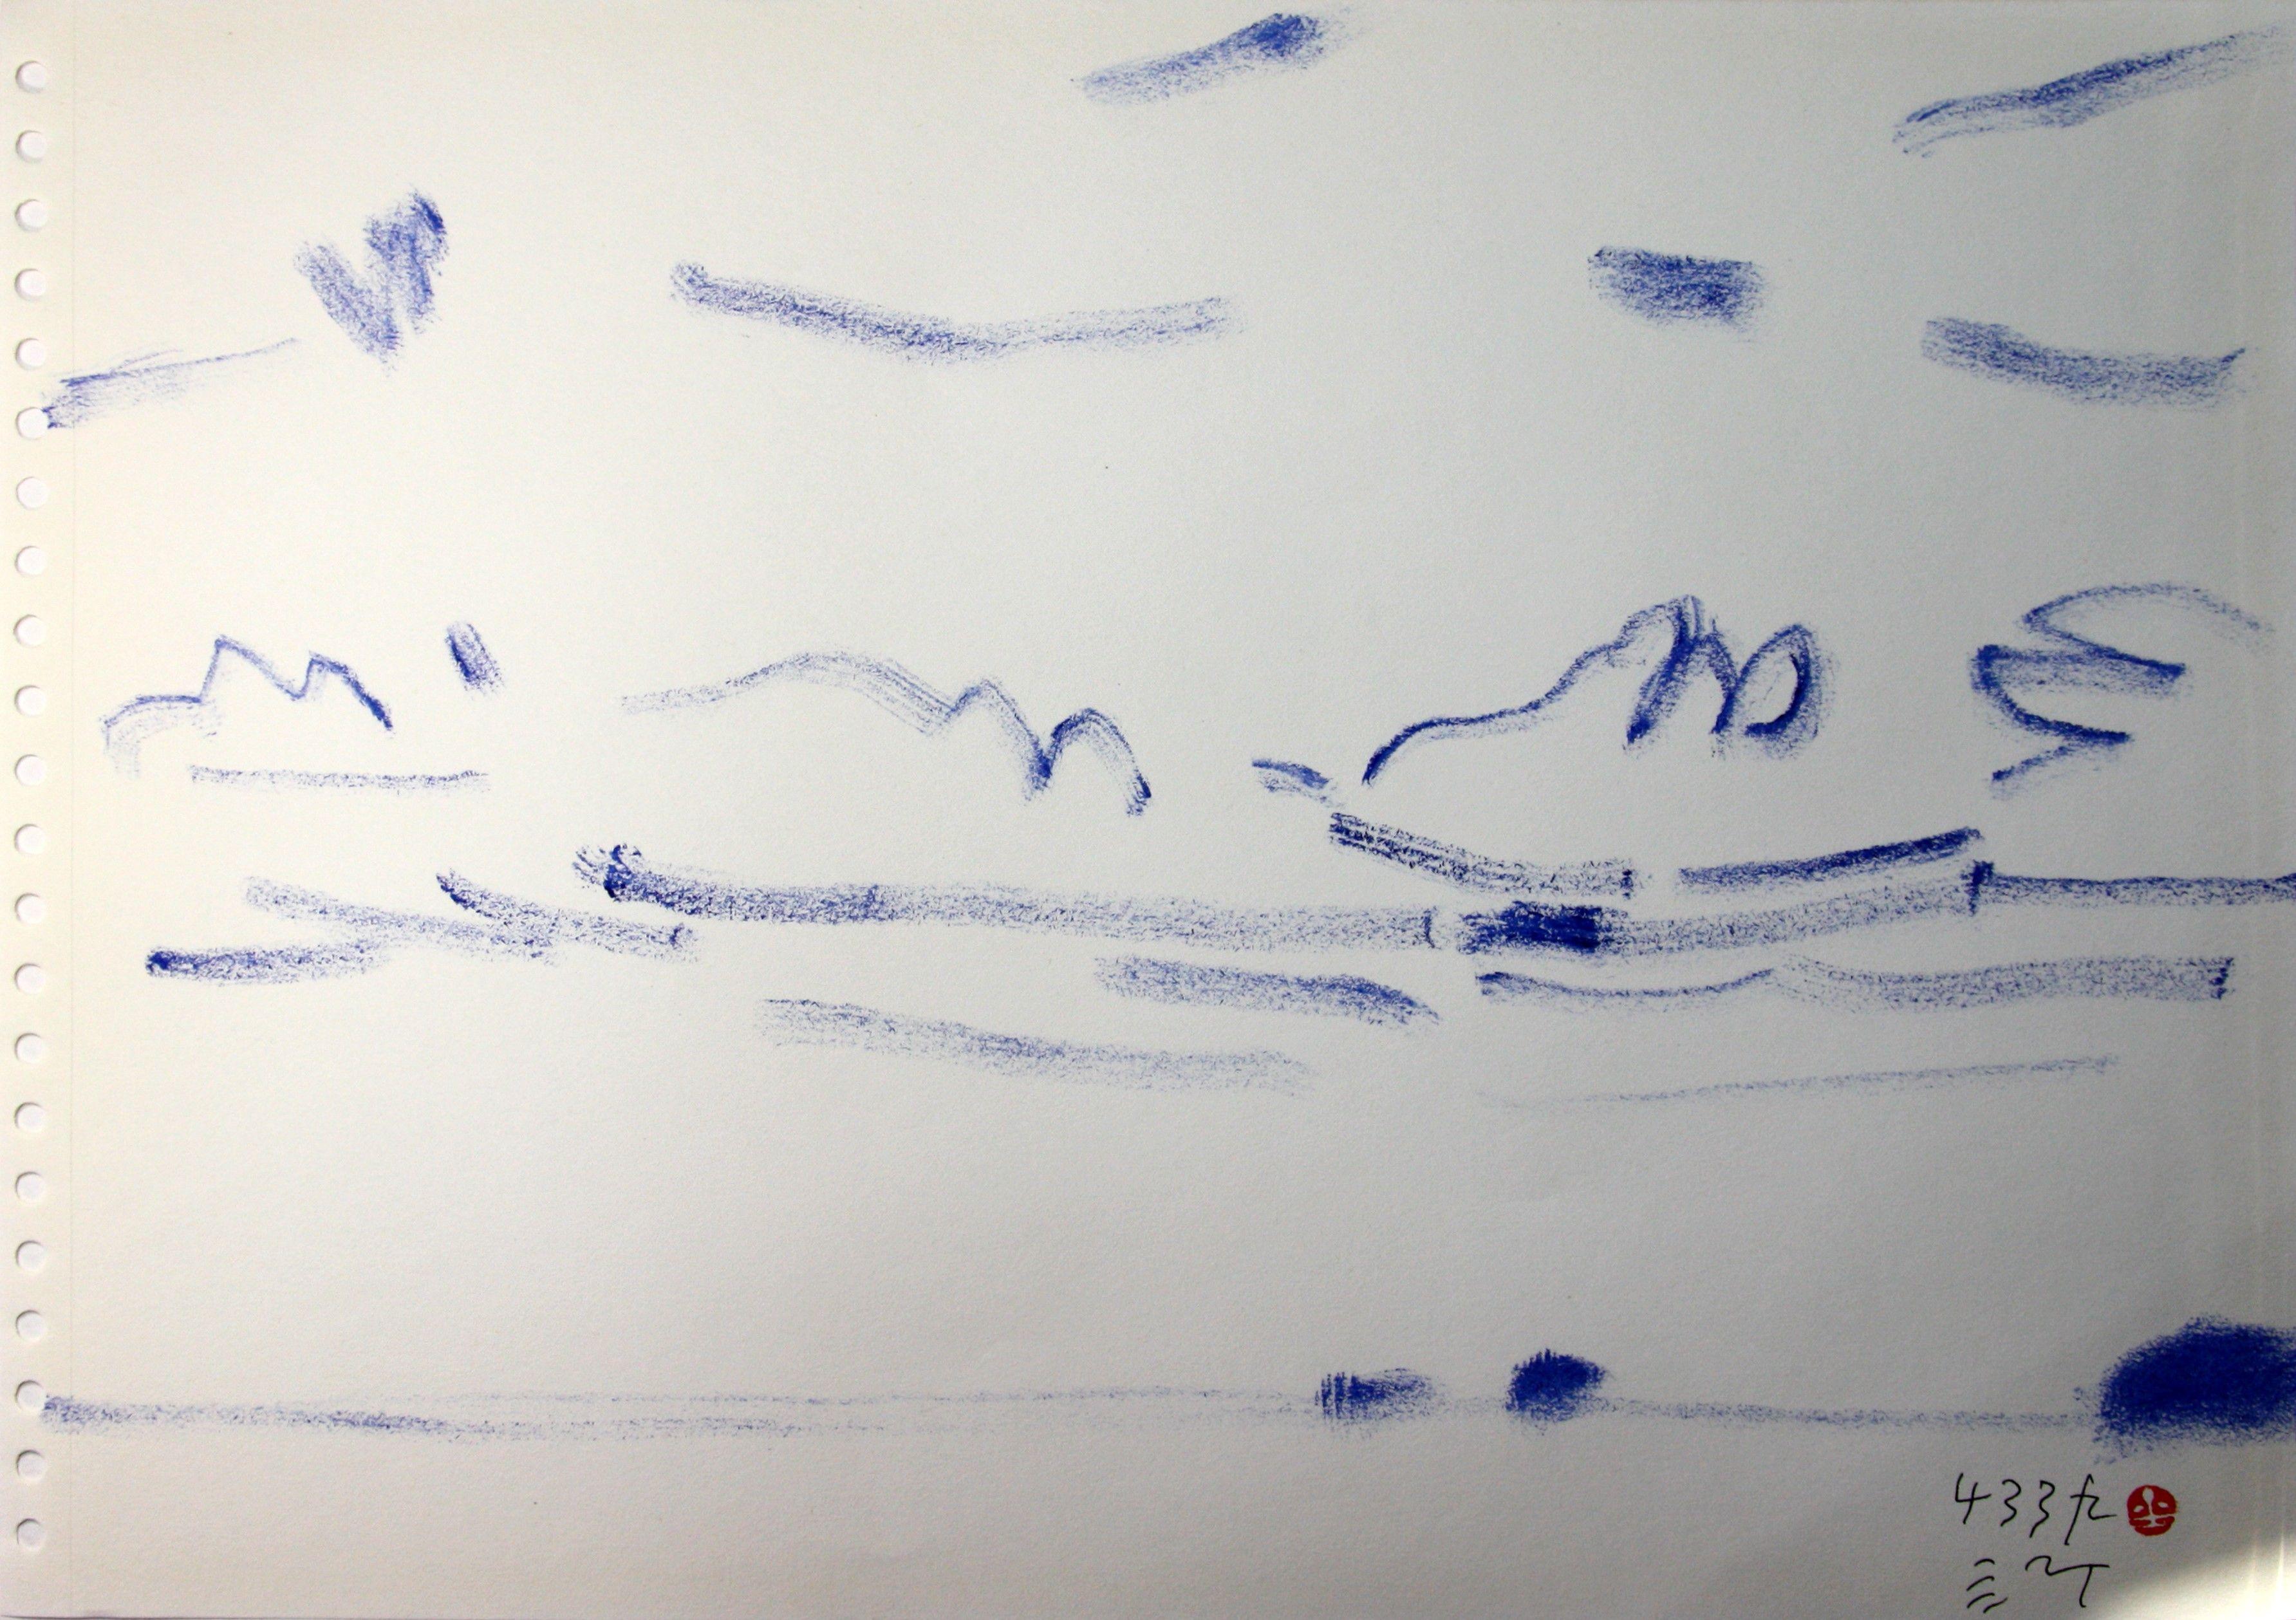 https://www.facebook.com/sahong.gum Gum-Sahong Drawing, JEJU,Landscape 금사홍, 드로잉